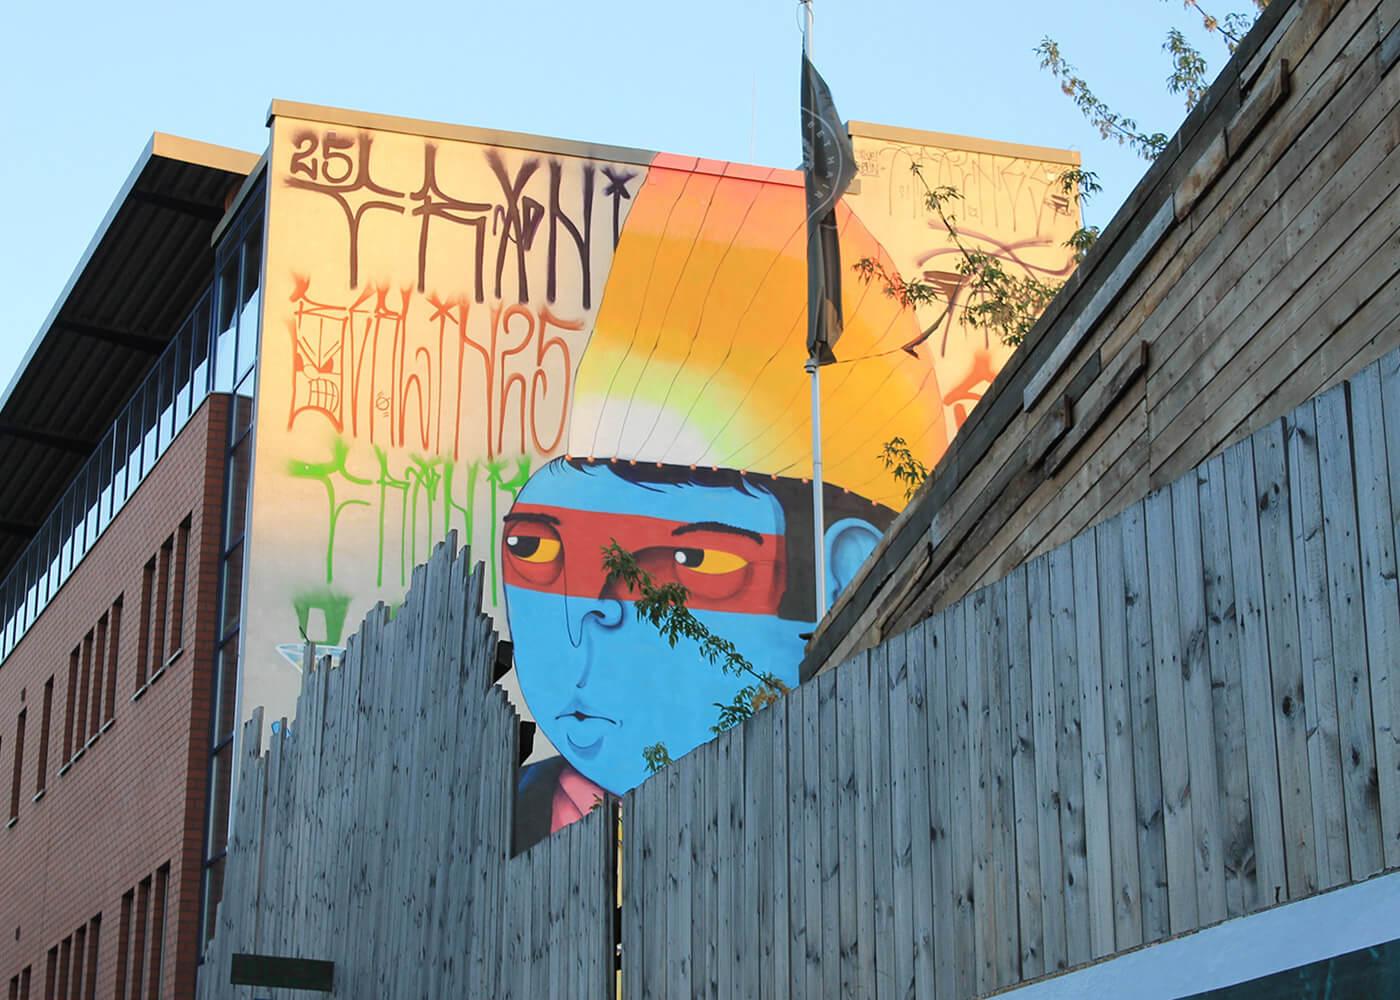 obra street art de Cranio